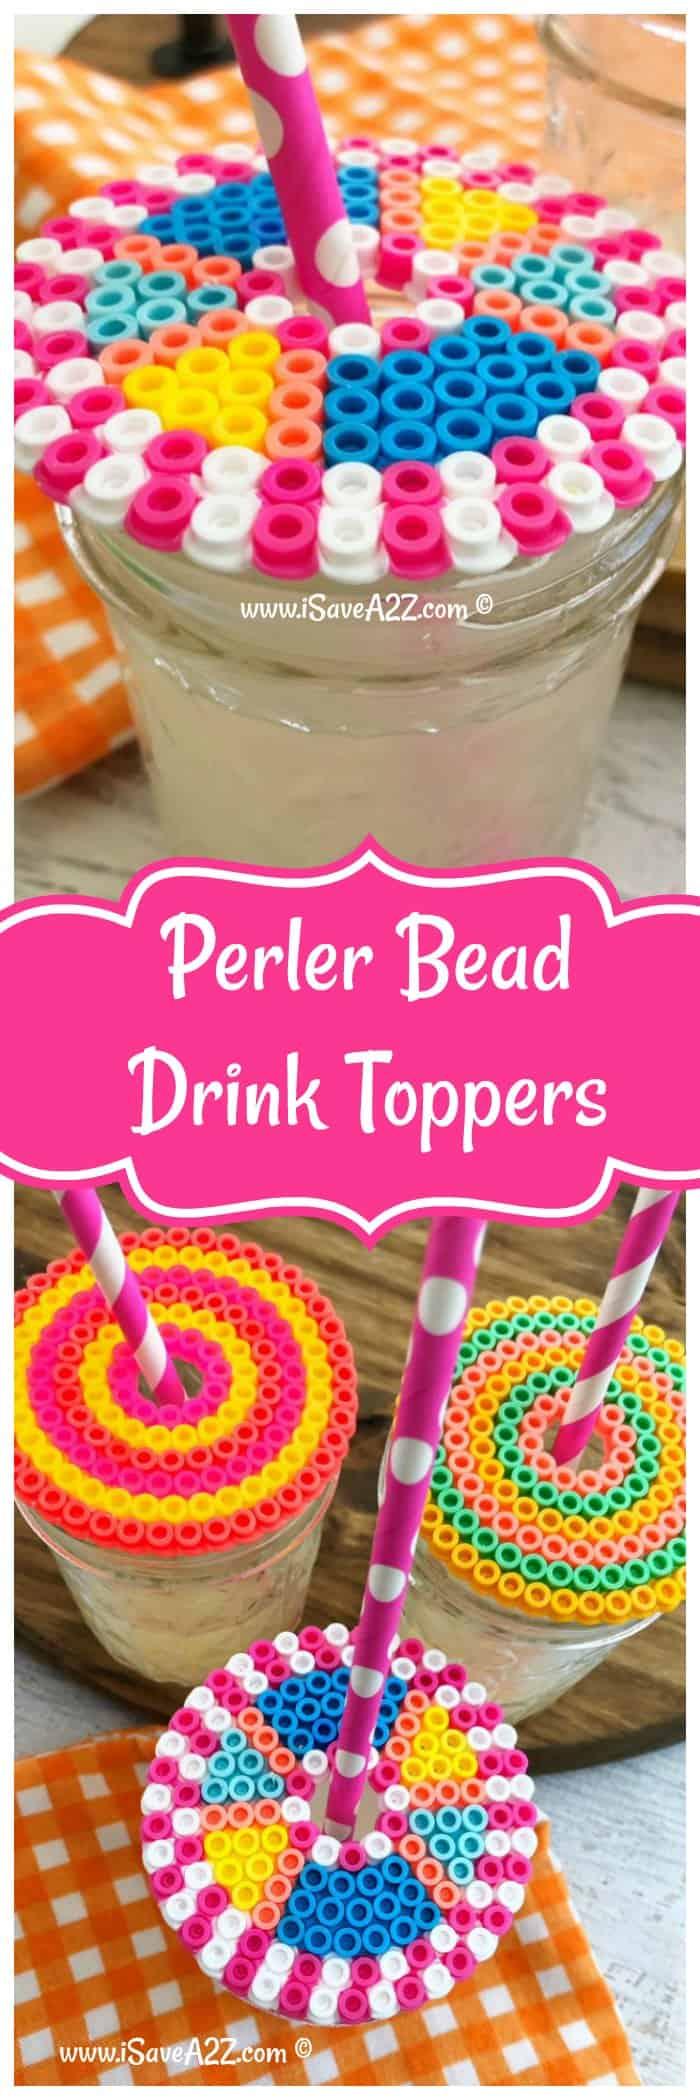 Perler Ideas:  Perler Beads Drink Topper